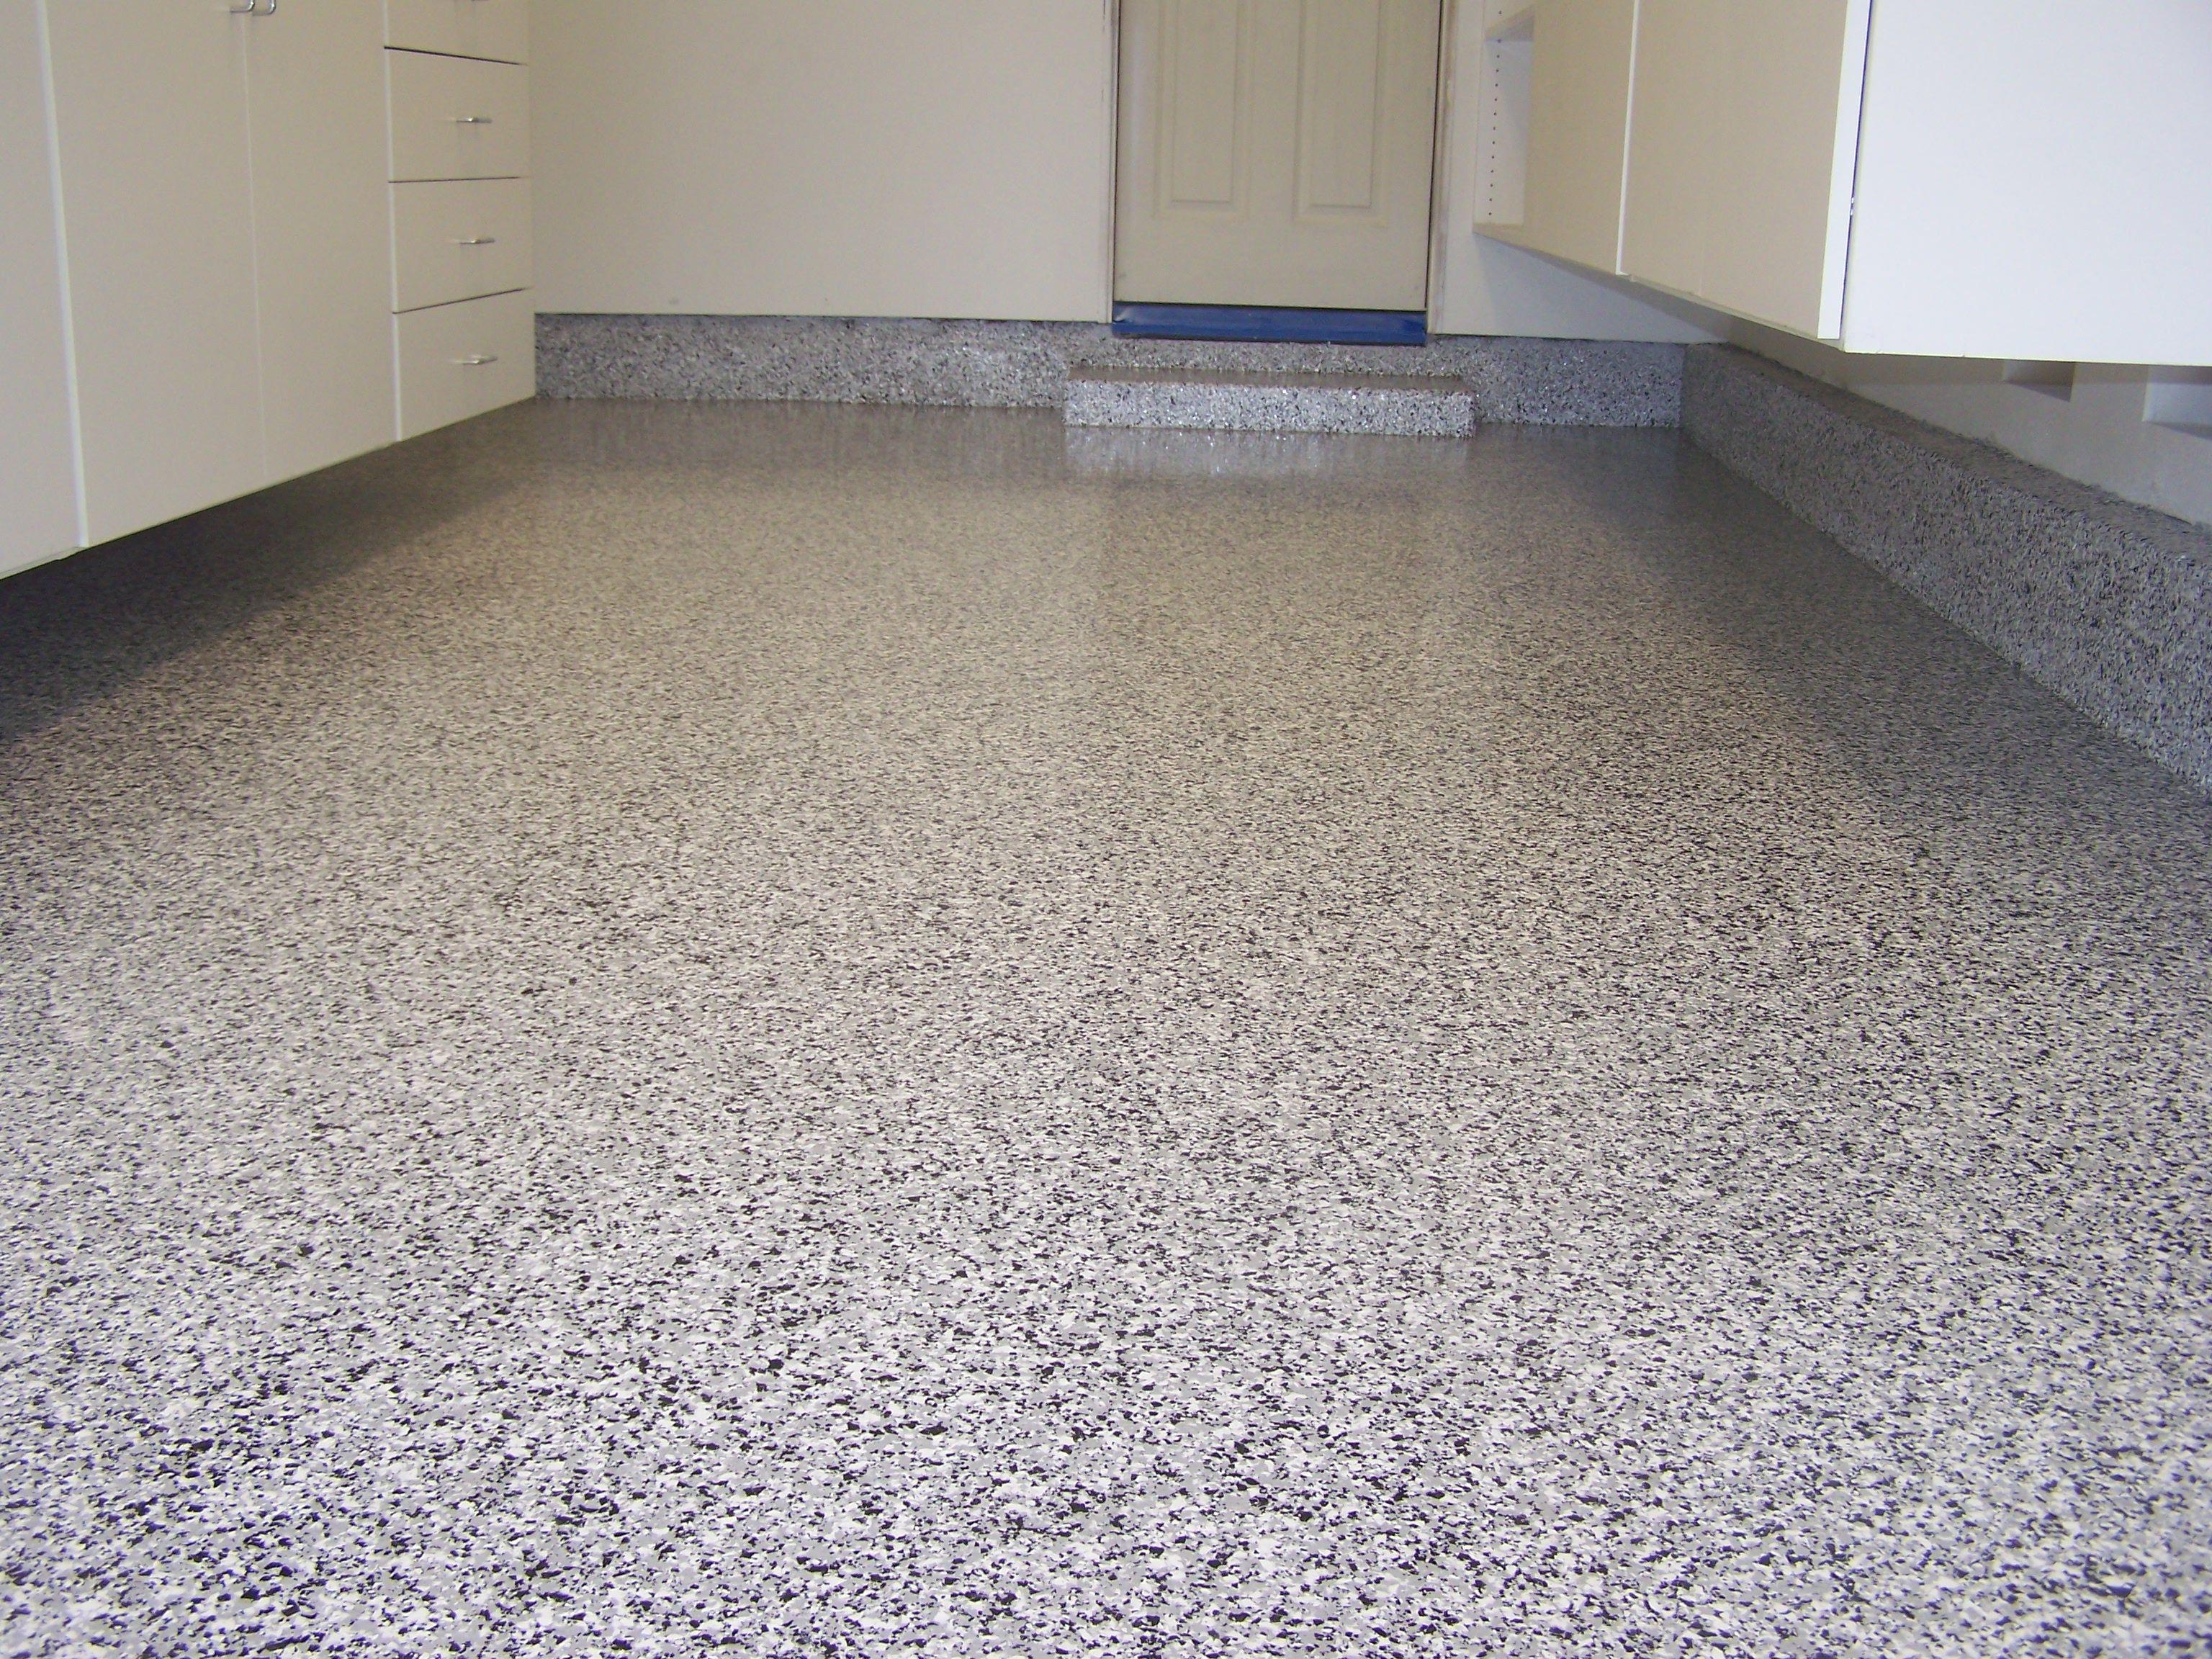 Work Portfolio Cfc Concrete Floor Coatings Inc Concrete Floor Coatings Concrete Epoxy Floor Coating